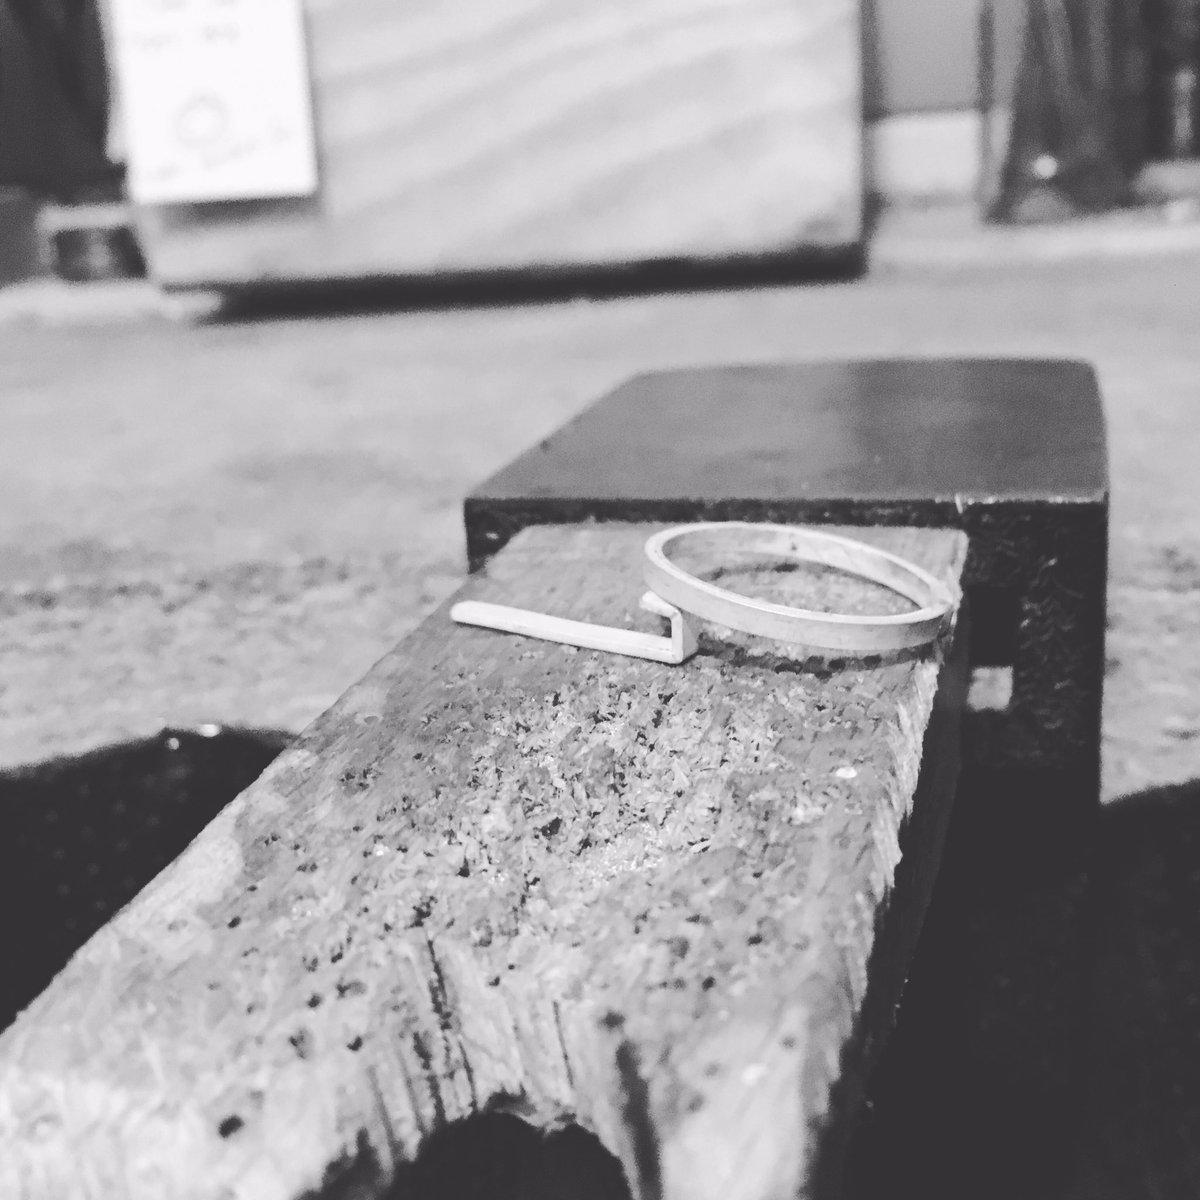 Happy Monday! New week = new project  #new #custom #ring #beginnings #monday #handmade #jewelry #blackandwhite  #progress #studio<br>http://pic.twitter.com/tc1l0alOaI